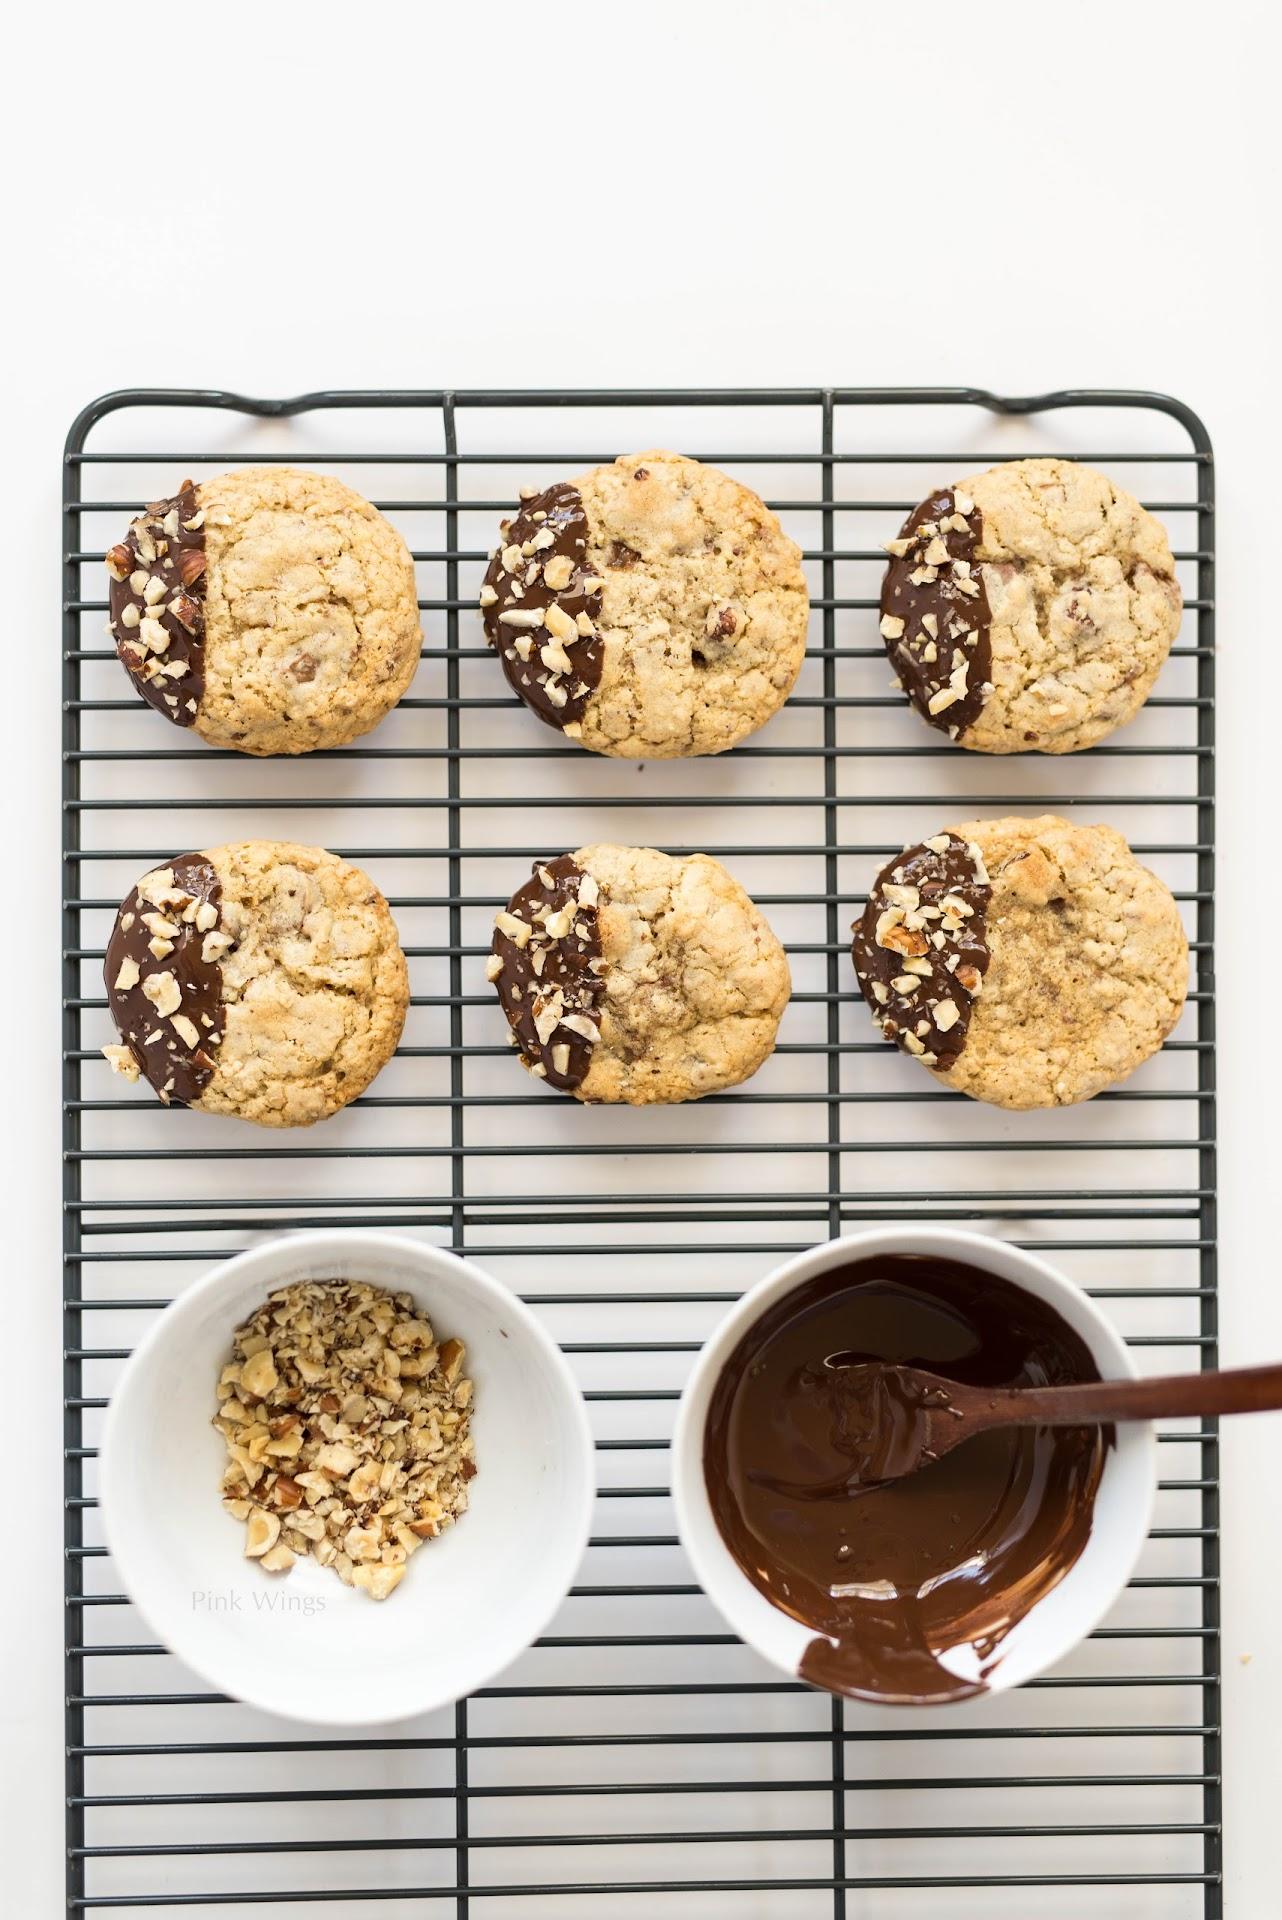 dipped cookies, dark chocolate, ritter, hazelnut dessert, toffee